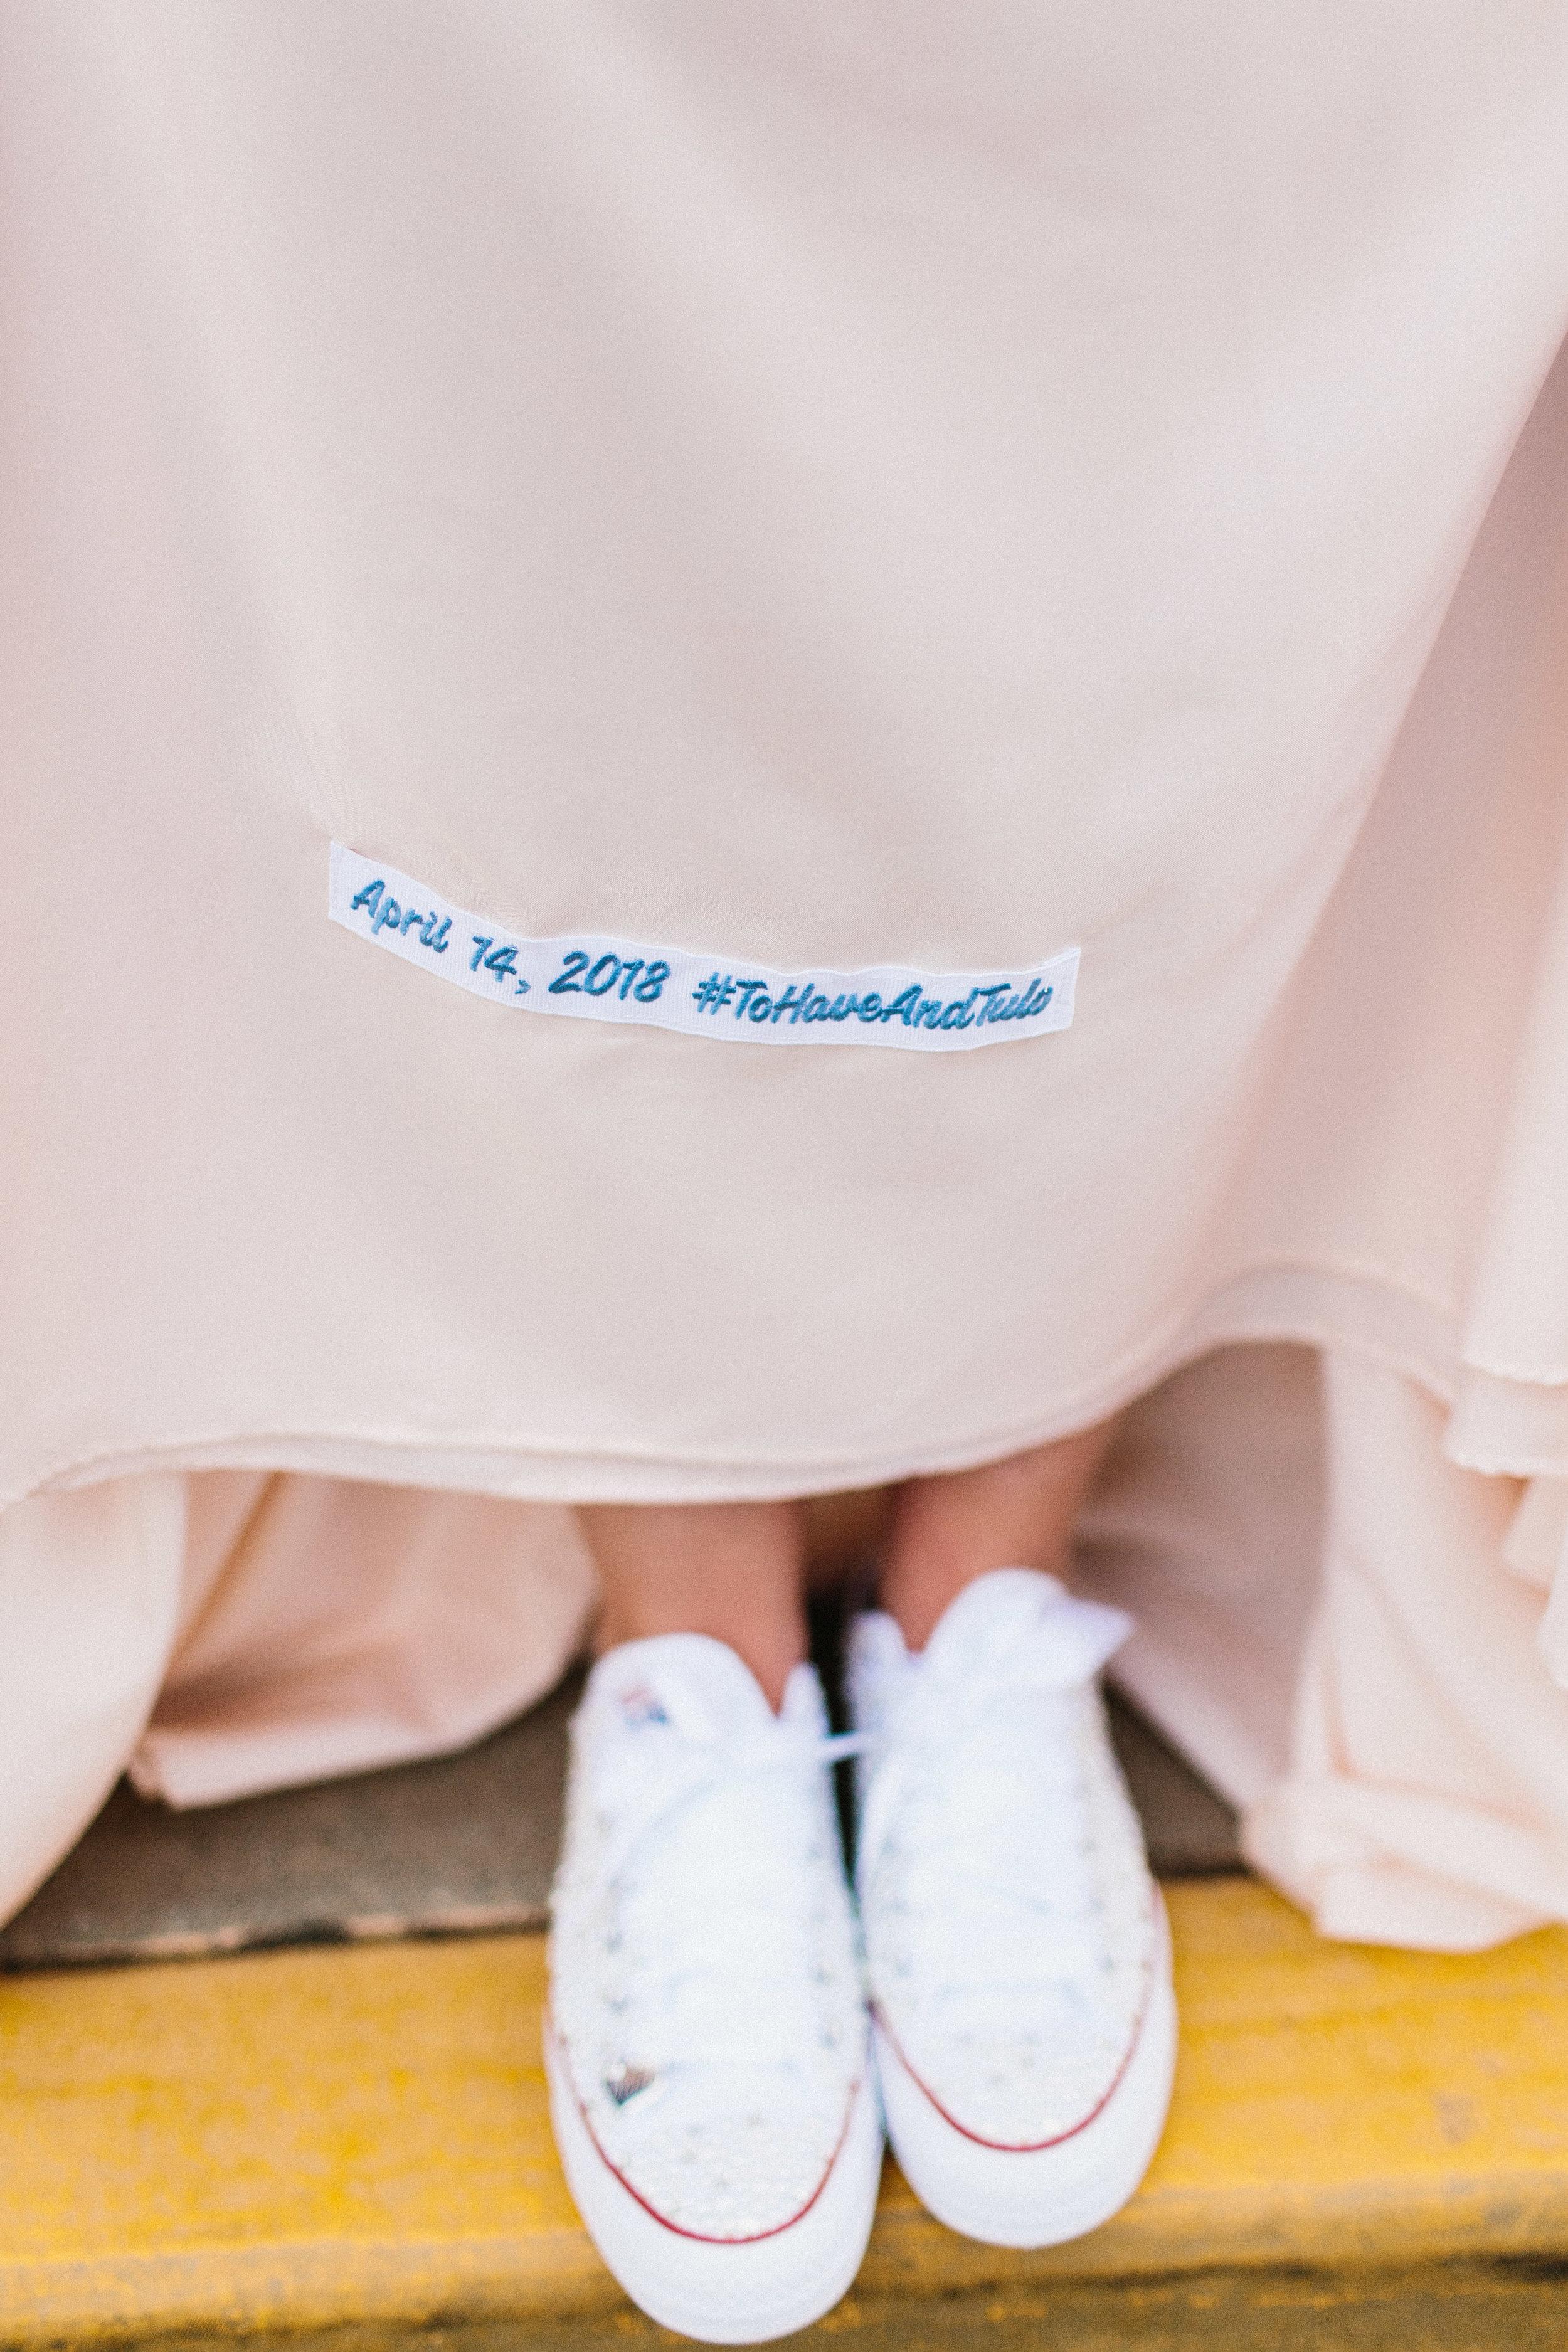 roswell_st_peter_chanel_catholic_avalon_hotel_alpharetta_wedding-1672.jpg